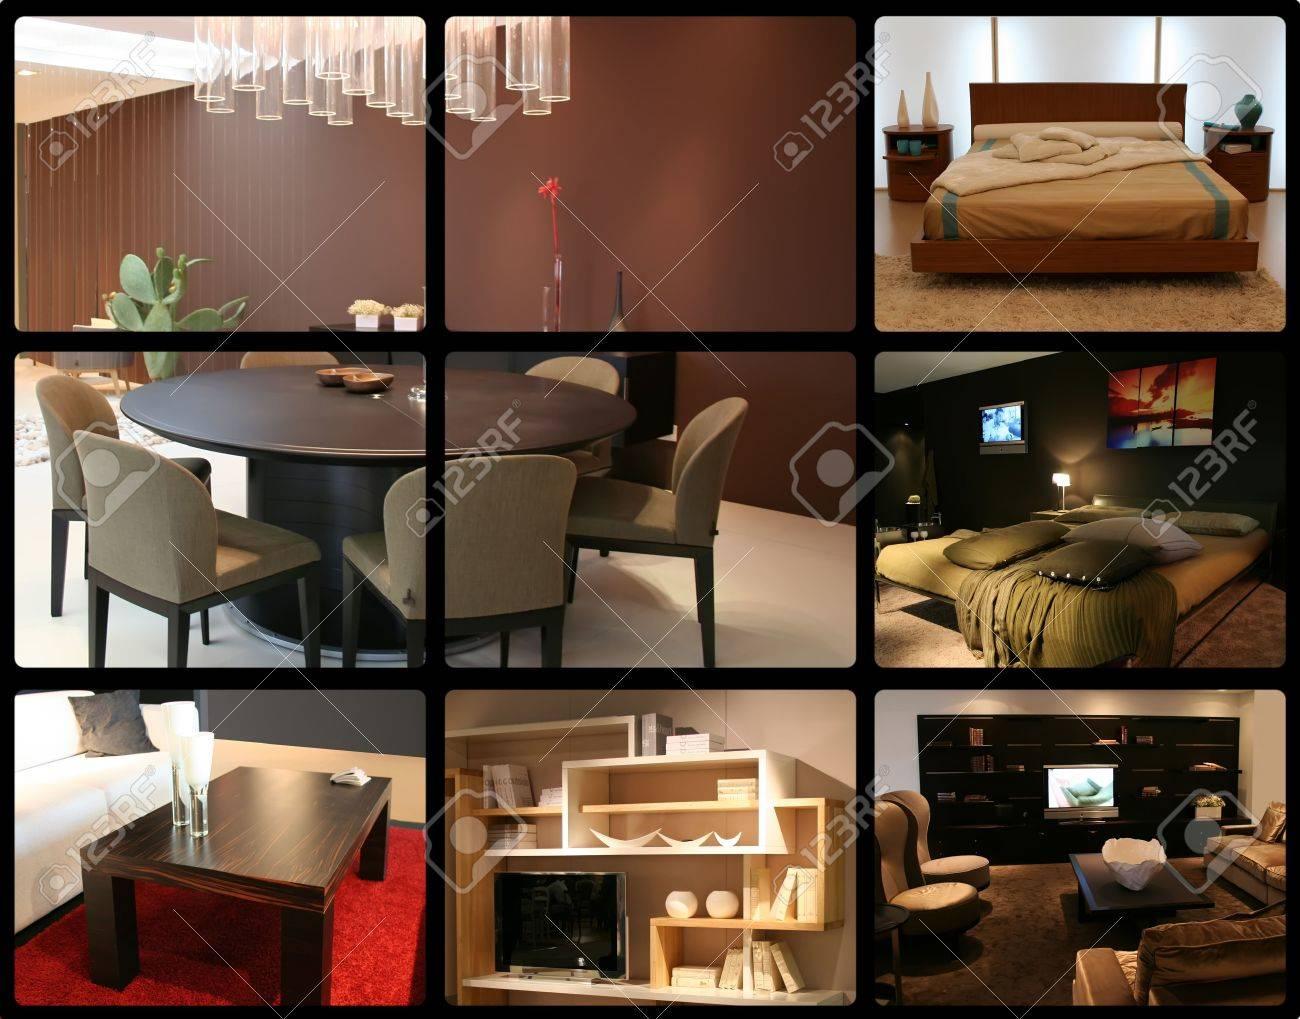 Slaapkamer en woonkamer decoratie ideeën   interieur royalty ...